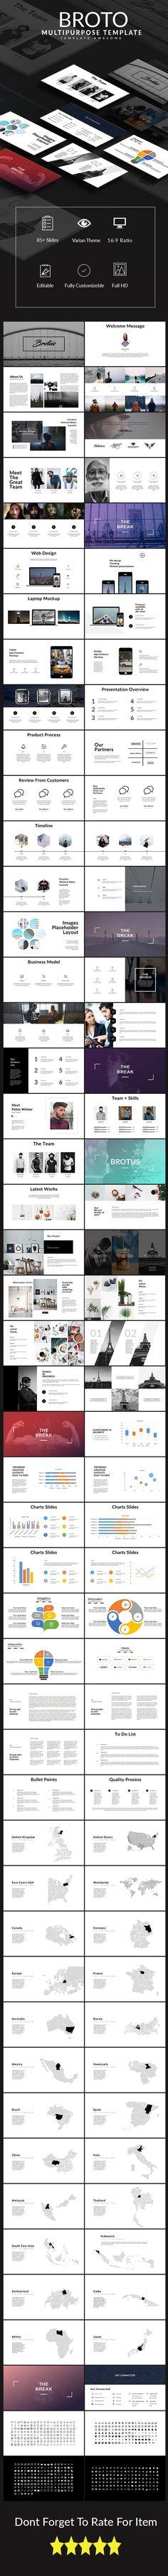 Brotus Multipurpose PowerPoint Template